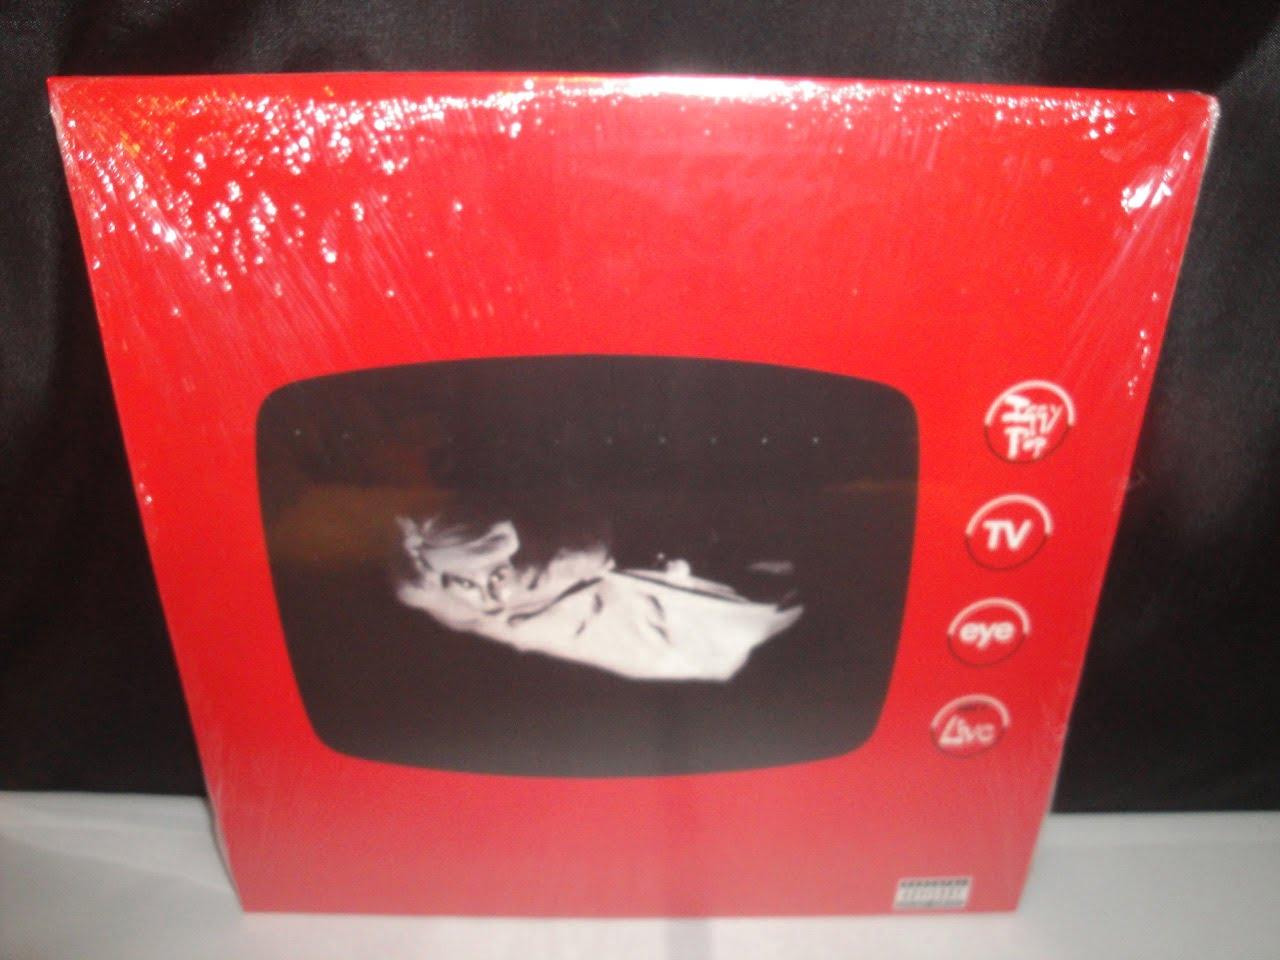 Iggy Pop - TV Eye Live - Limited Edition 120 Gram Vinyl Reissue